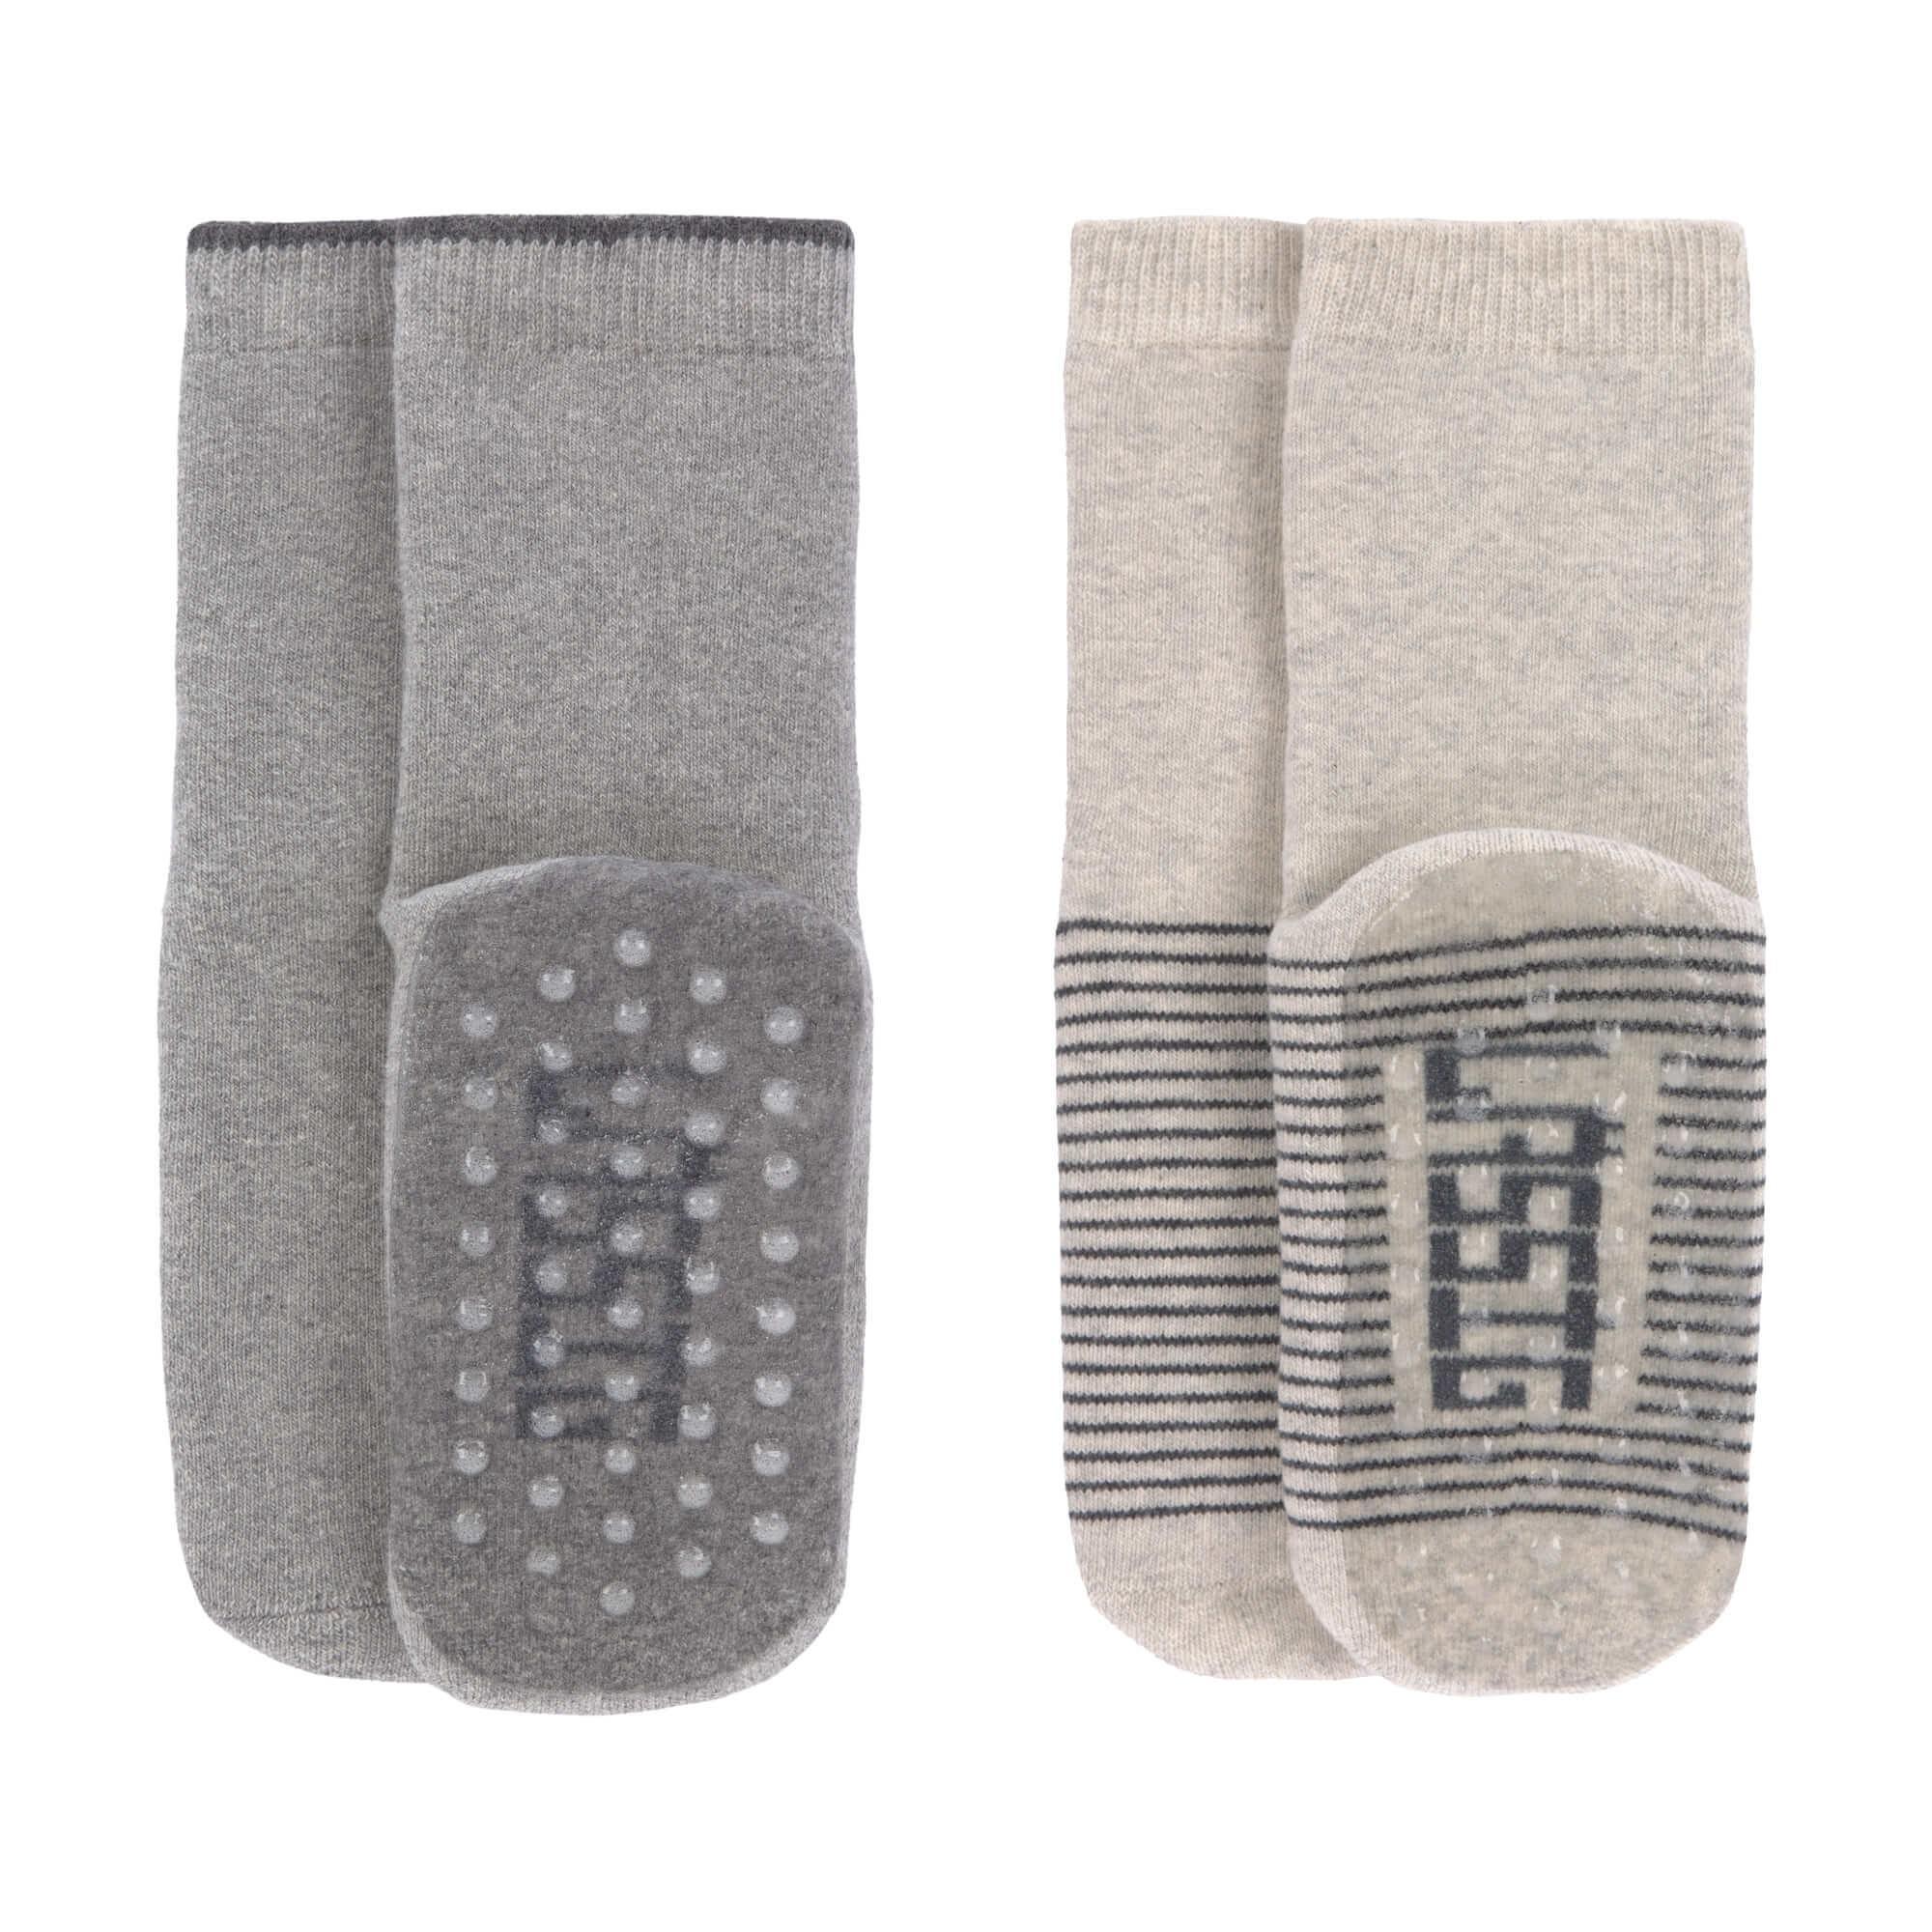 Lassig - Anti-slip Socks 2 pcs. assorted grey/beige, Size: 19-22